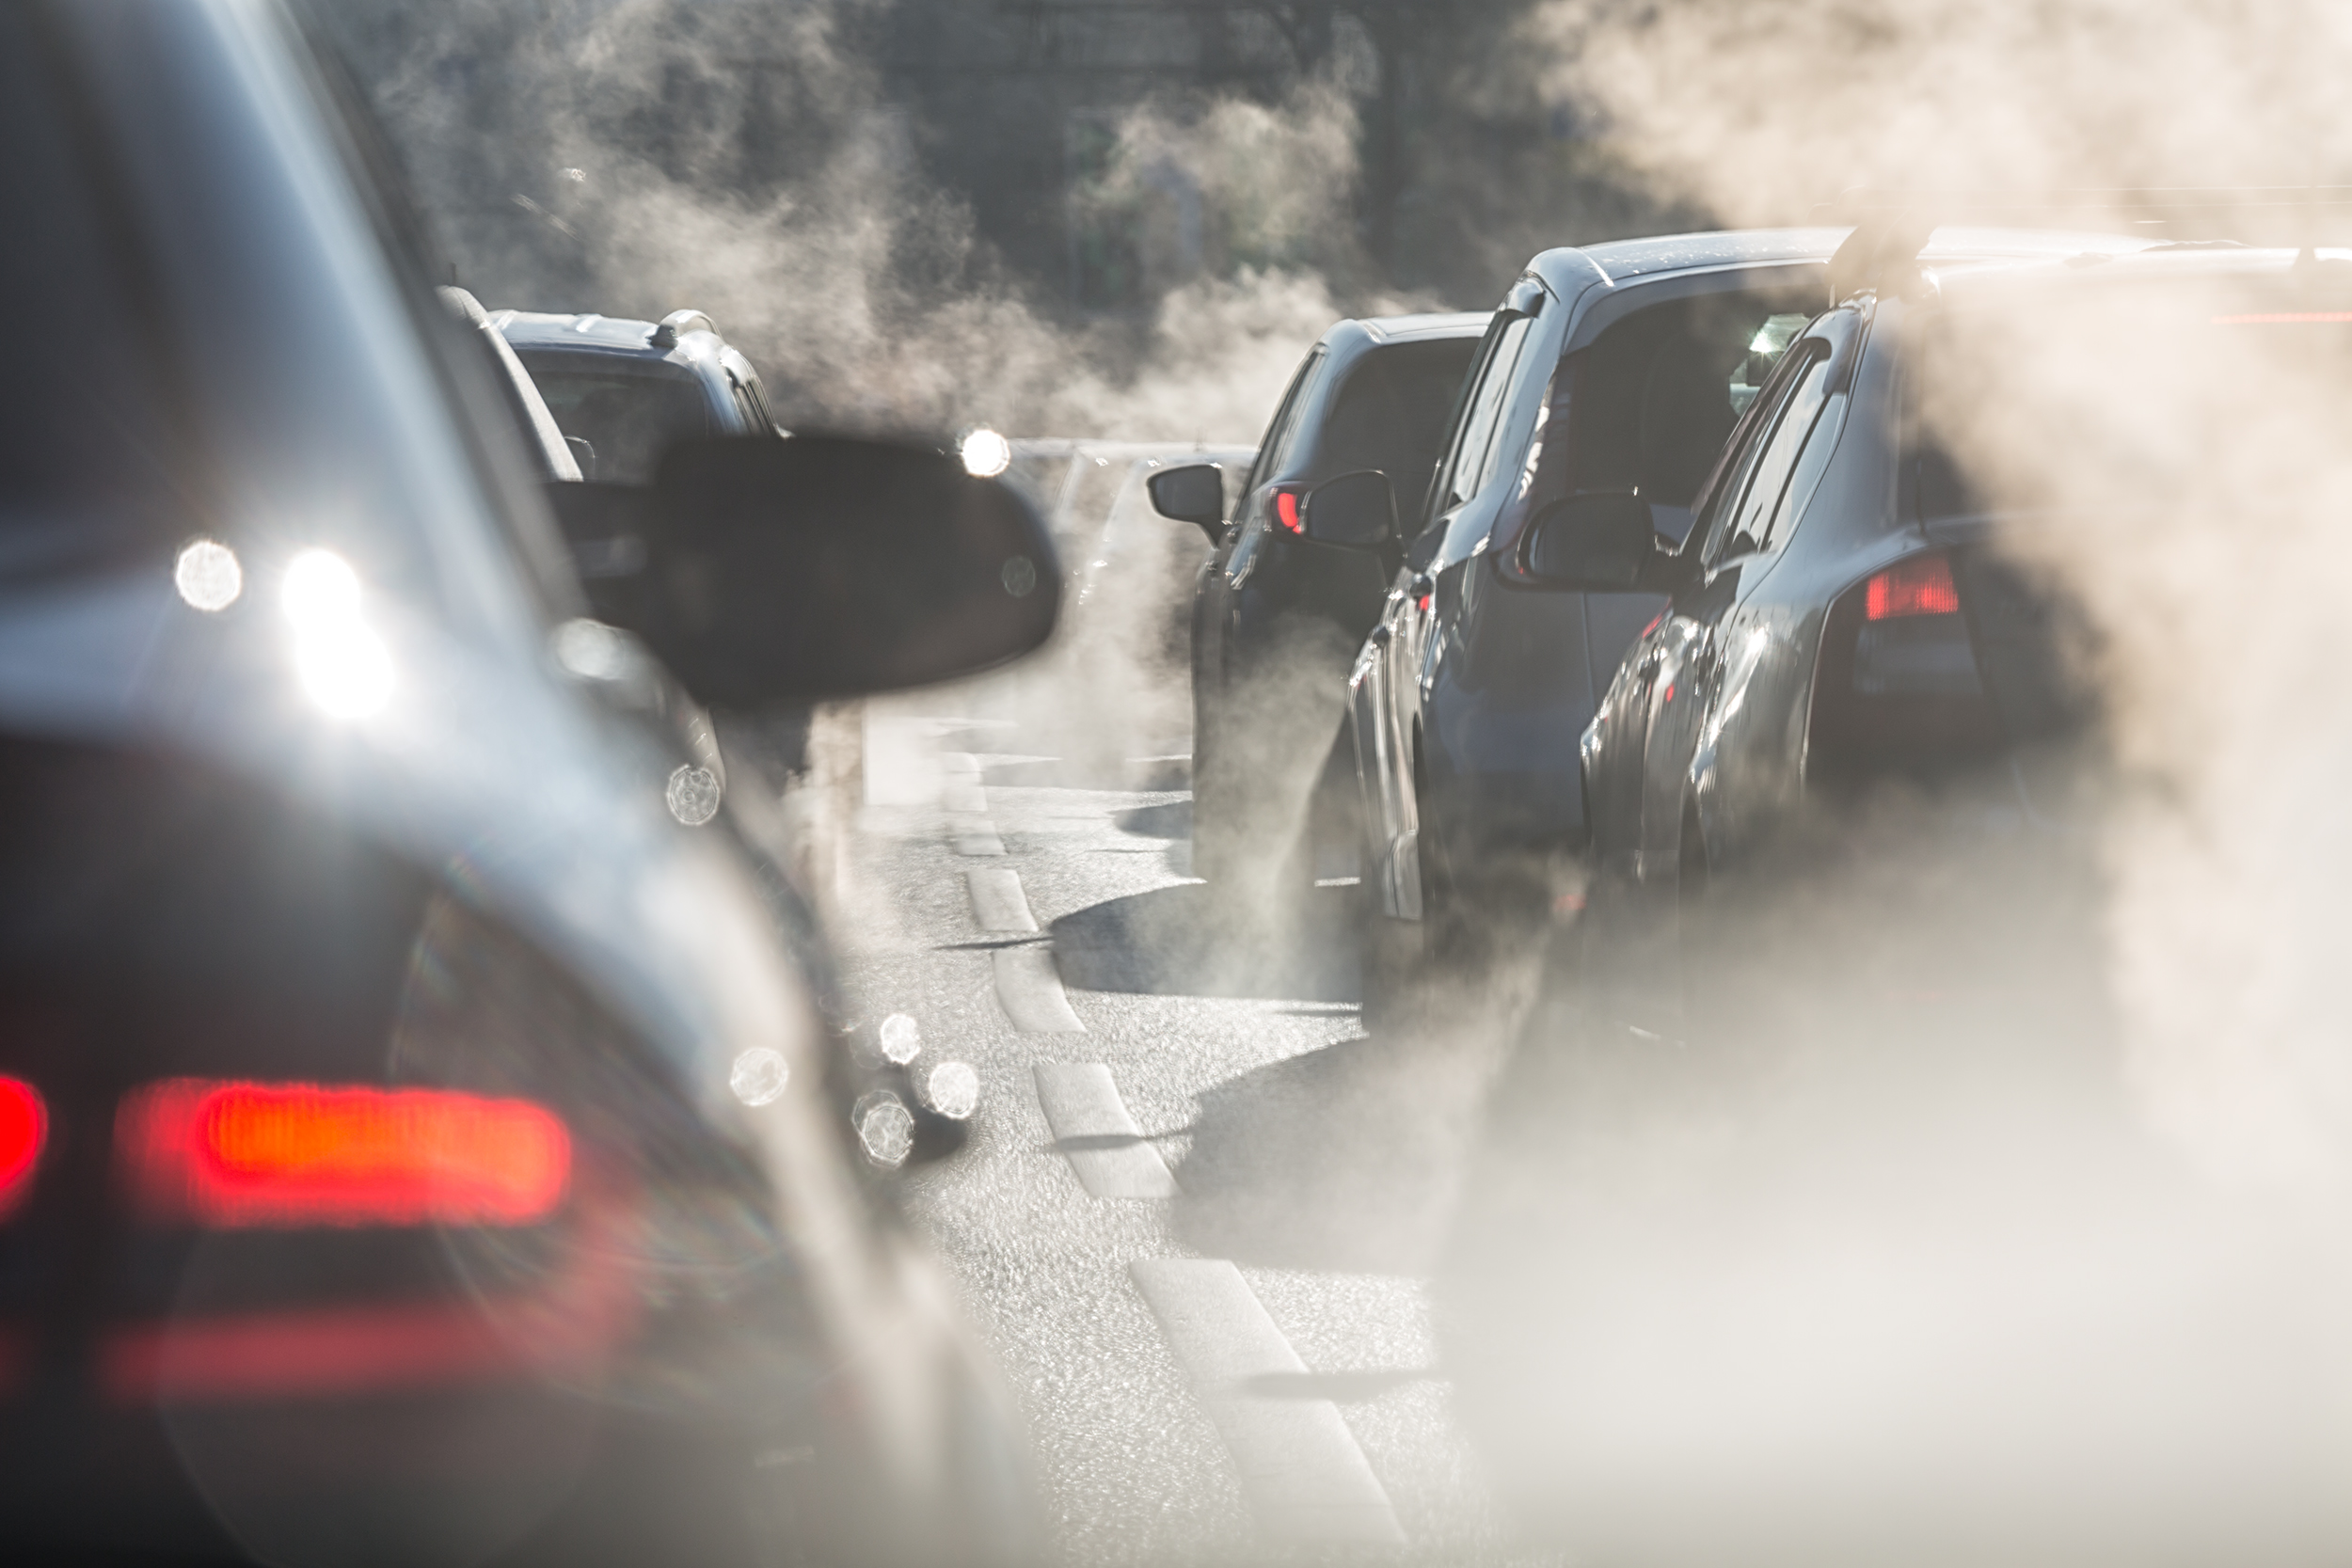 Car exhaust fumes emit damaging particles